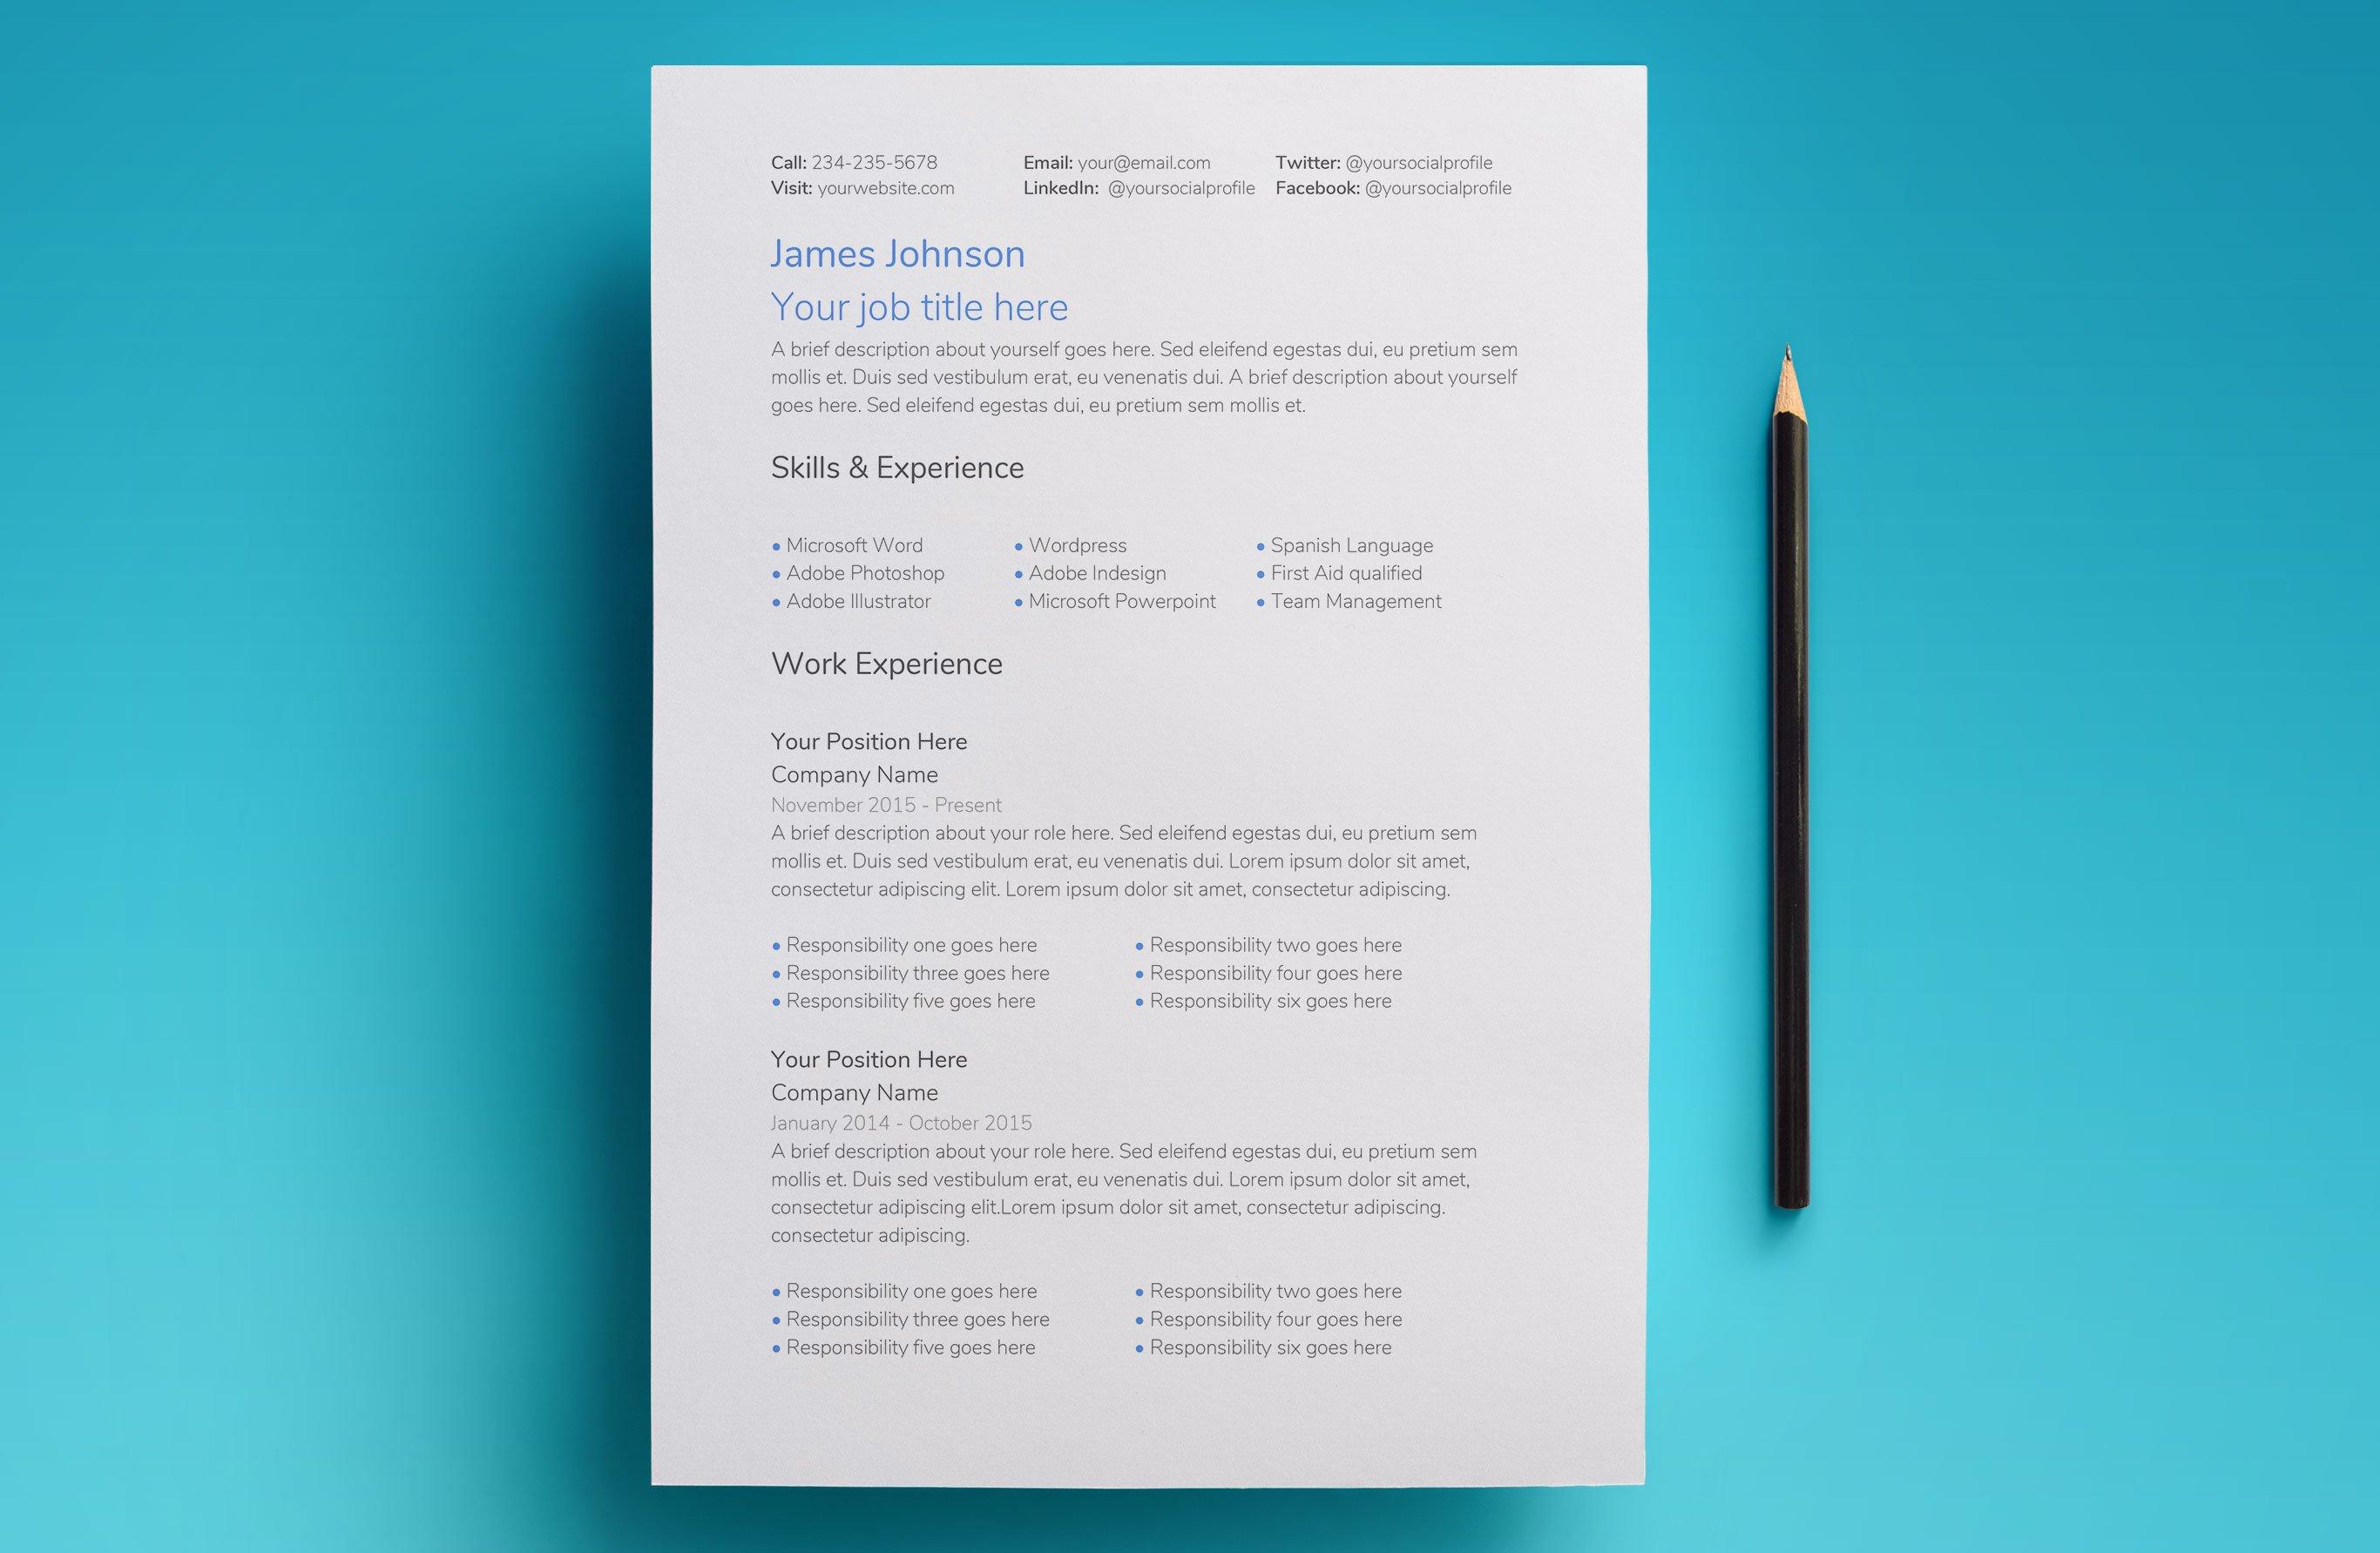 google docs resume template professional 2017 design cv template - Resume Templates Google Docs